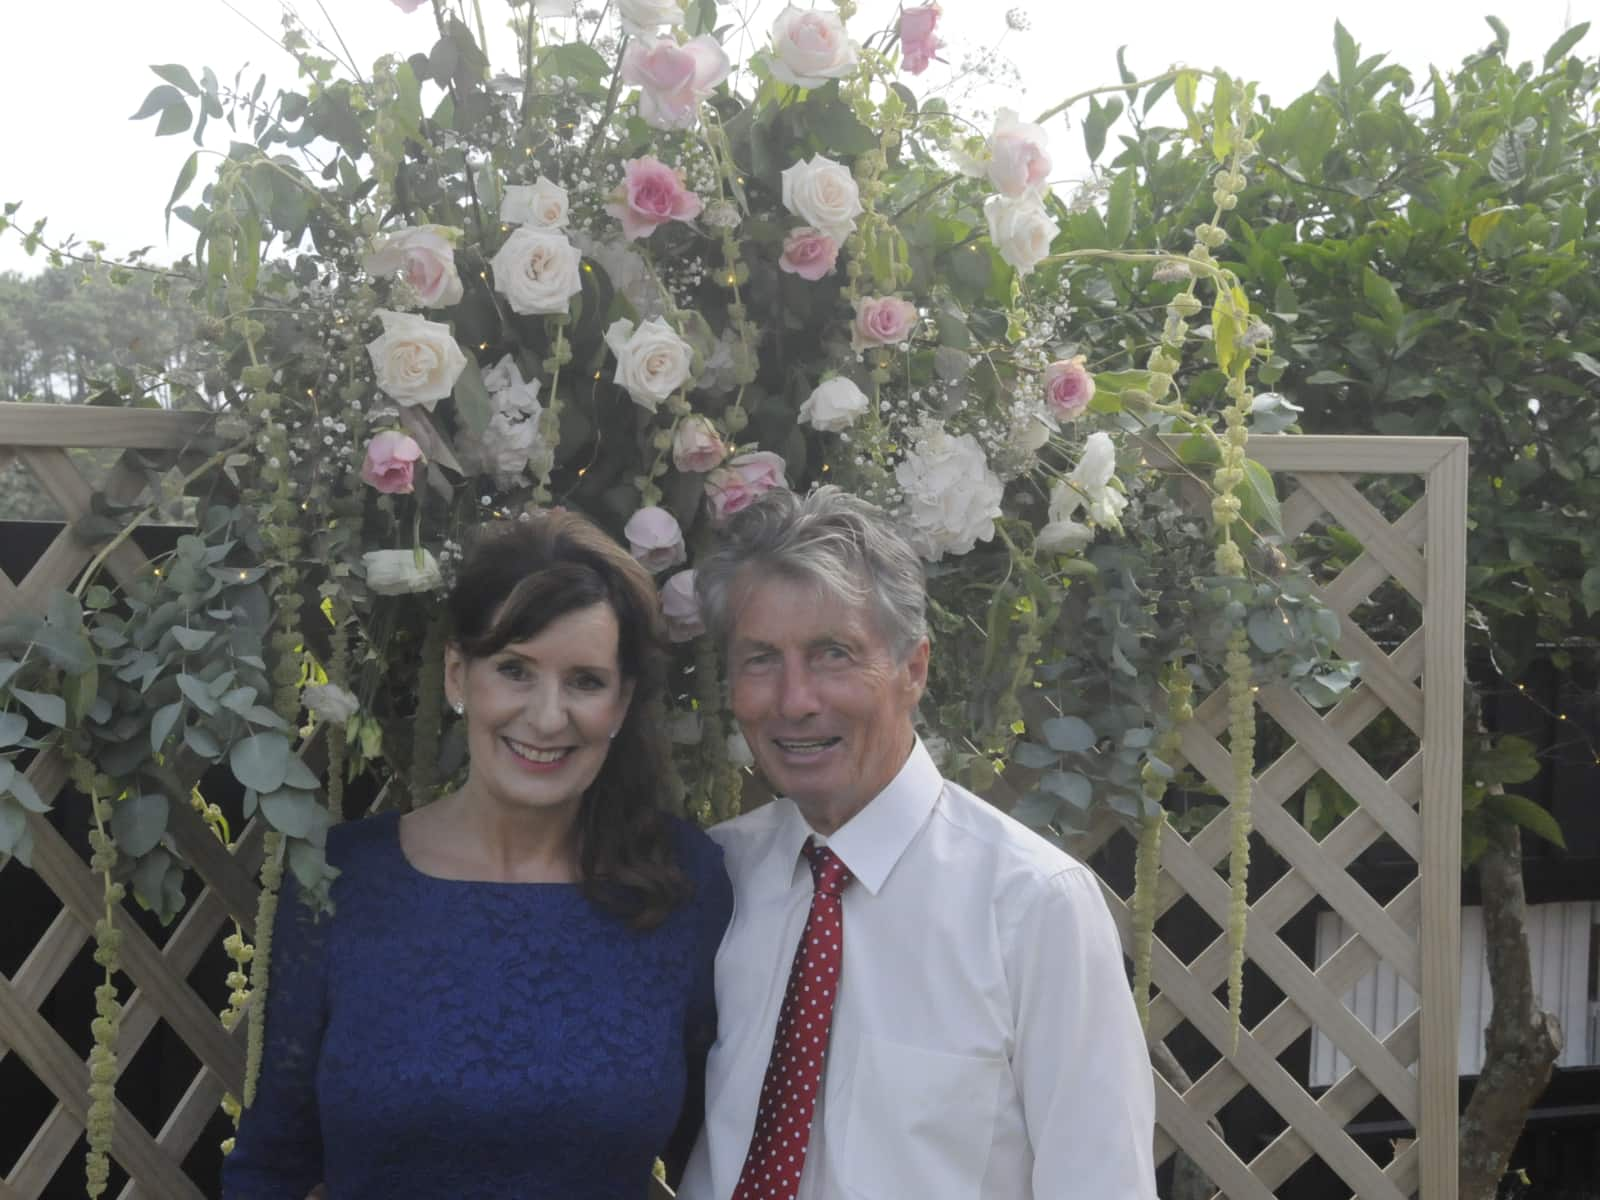 Annie & Quentin from Otaki, New Zealand